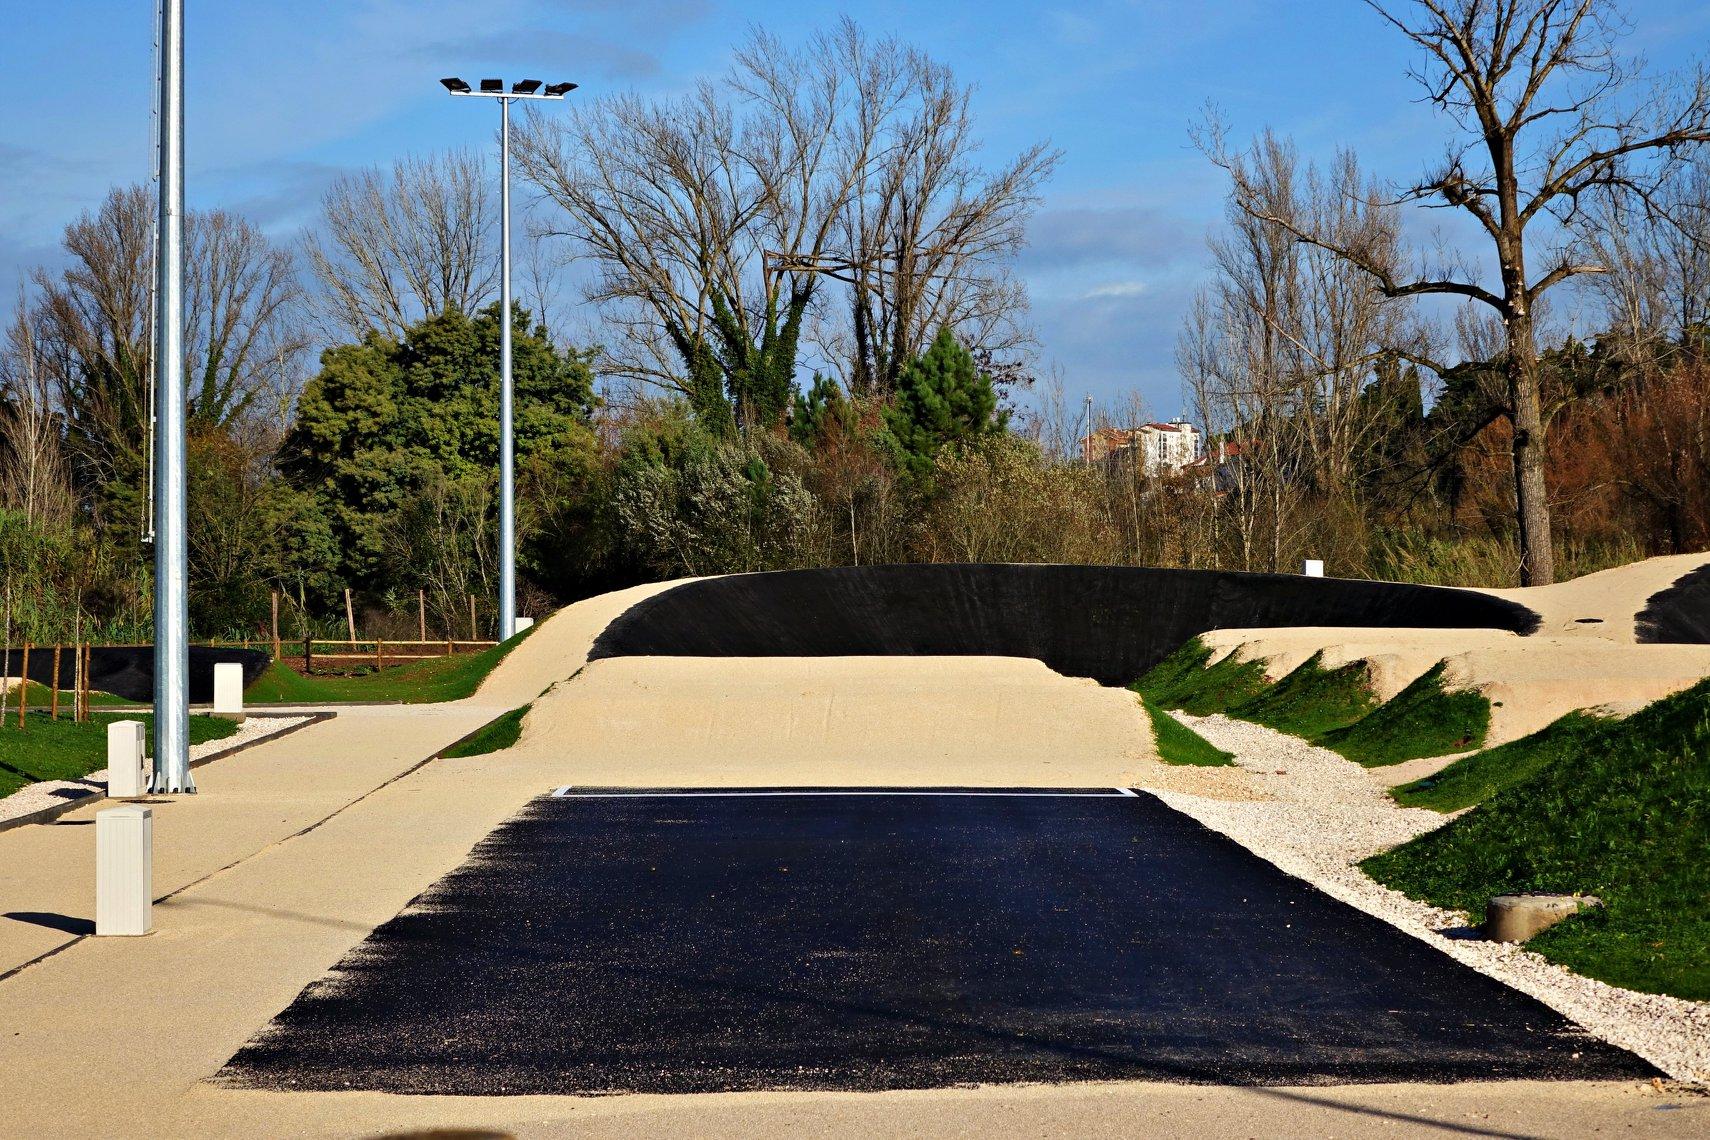 Pista BMX de Coimbra